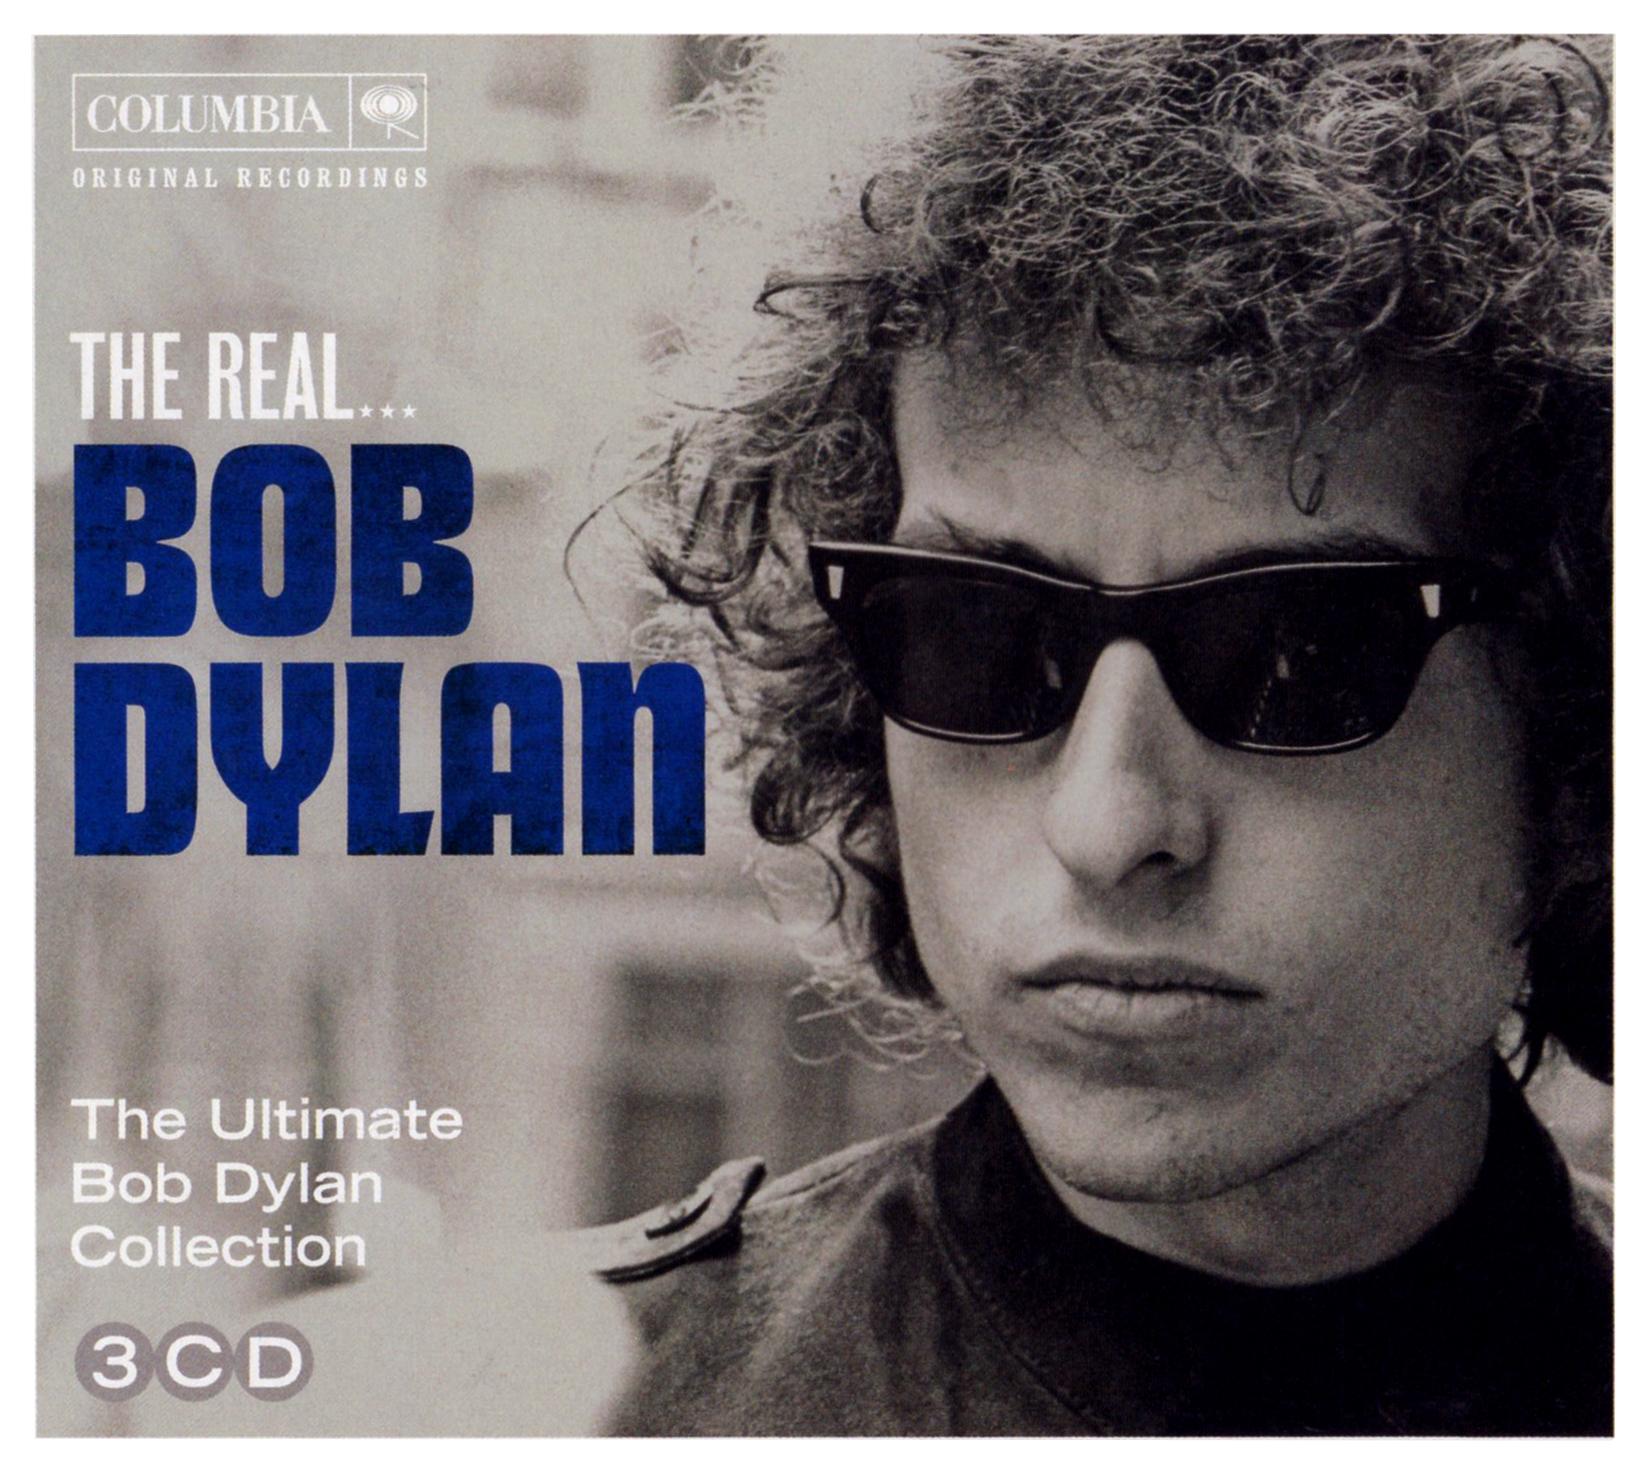 Bob Dylan (ボブ・ディラン) 3枚組ベスト・アルバム『THE REAL… The Ultimate Bob Dylan Collection』(2012年11月22日発売) 高画質CDジャケット画像